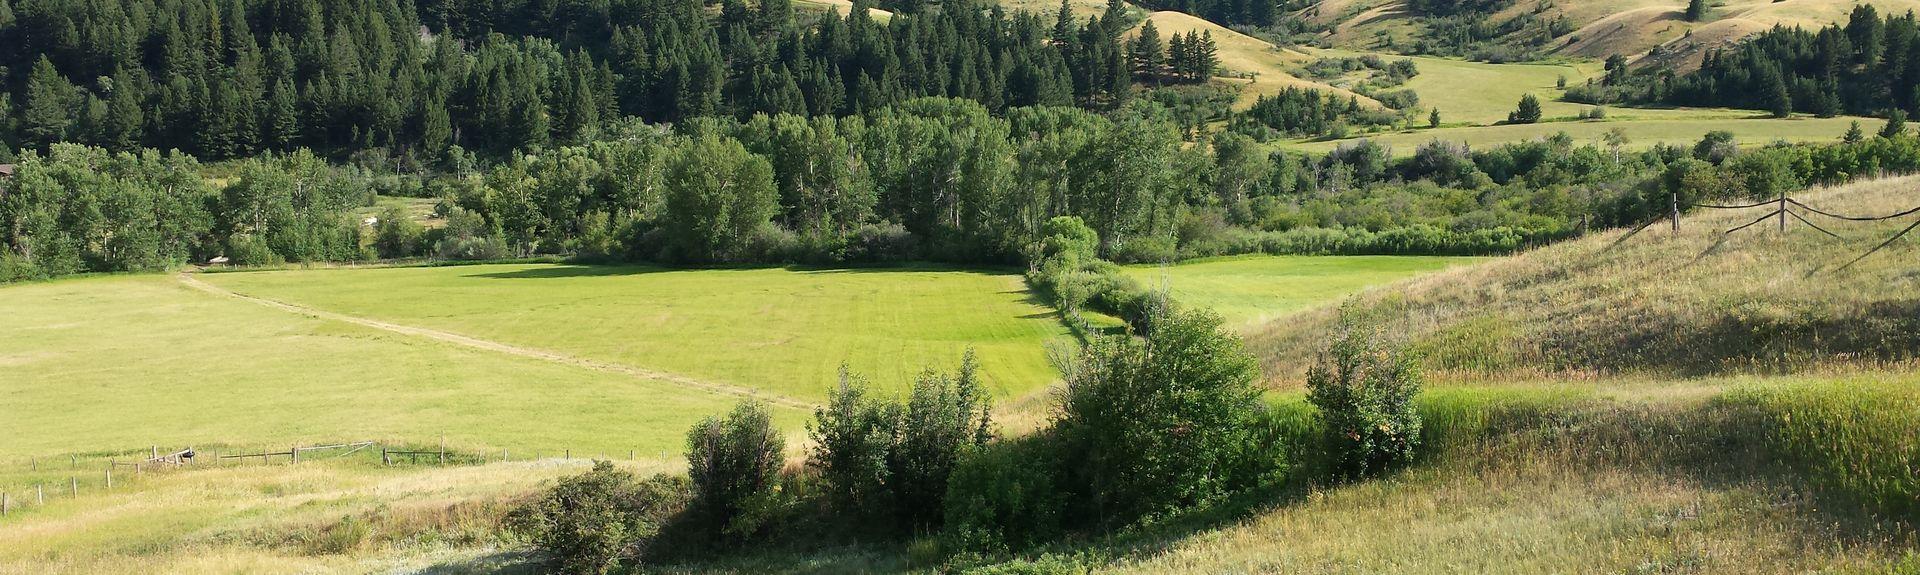 Vrbo   Bozeman, MT Vacation Rentals: cabin rentals & more